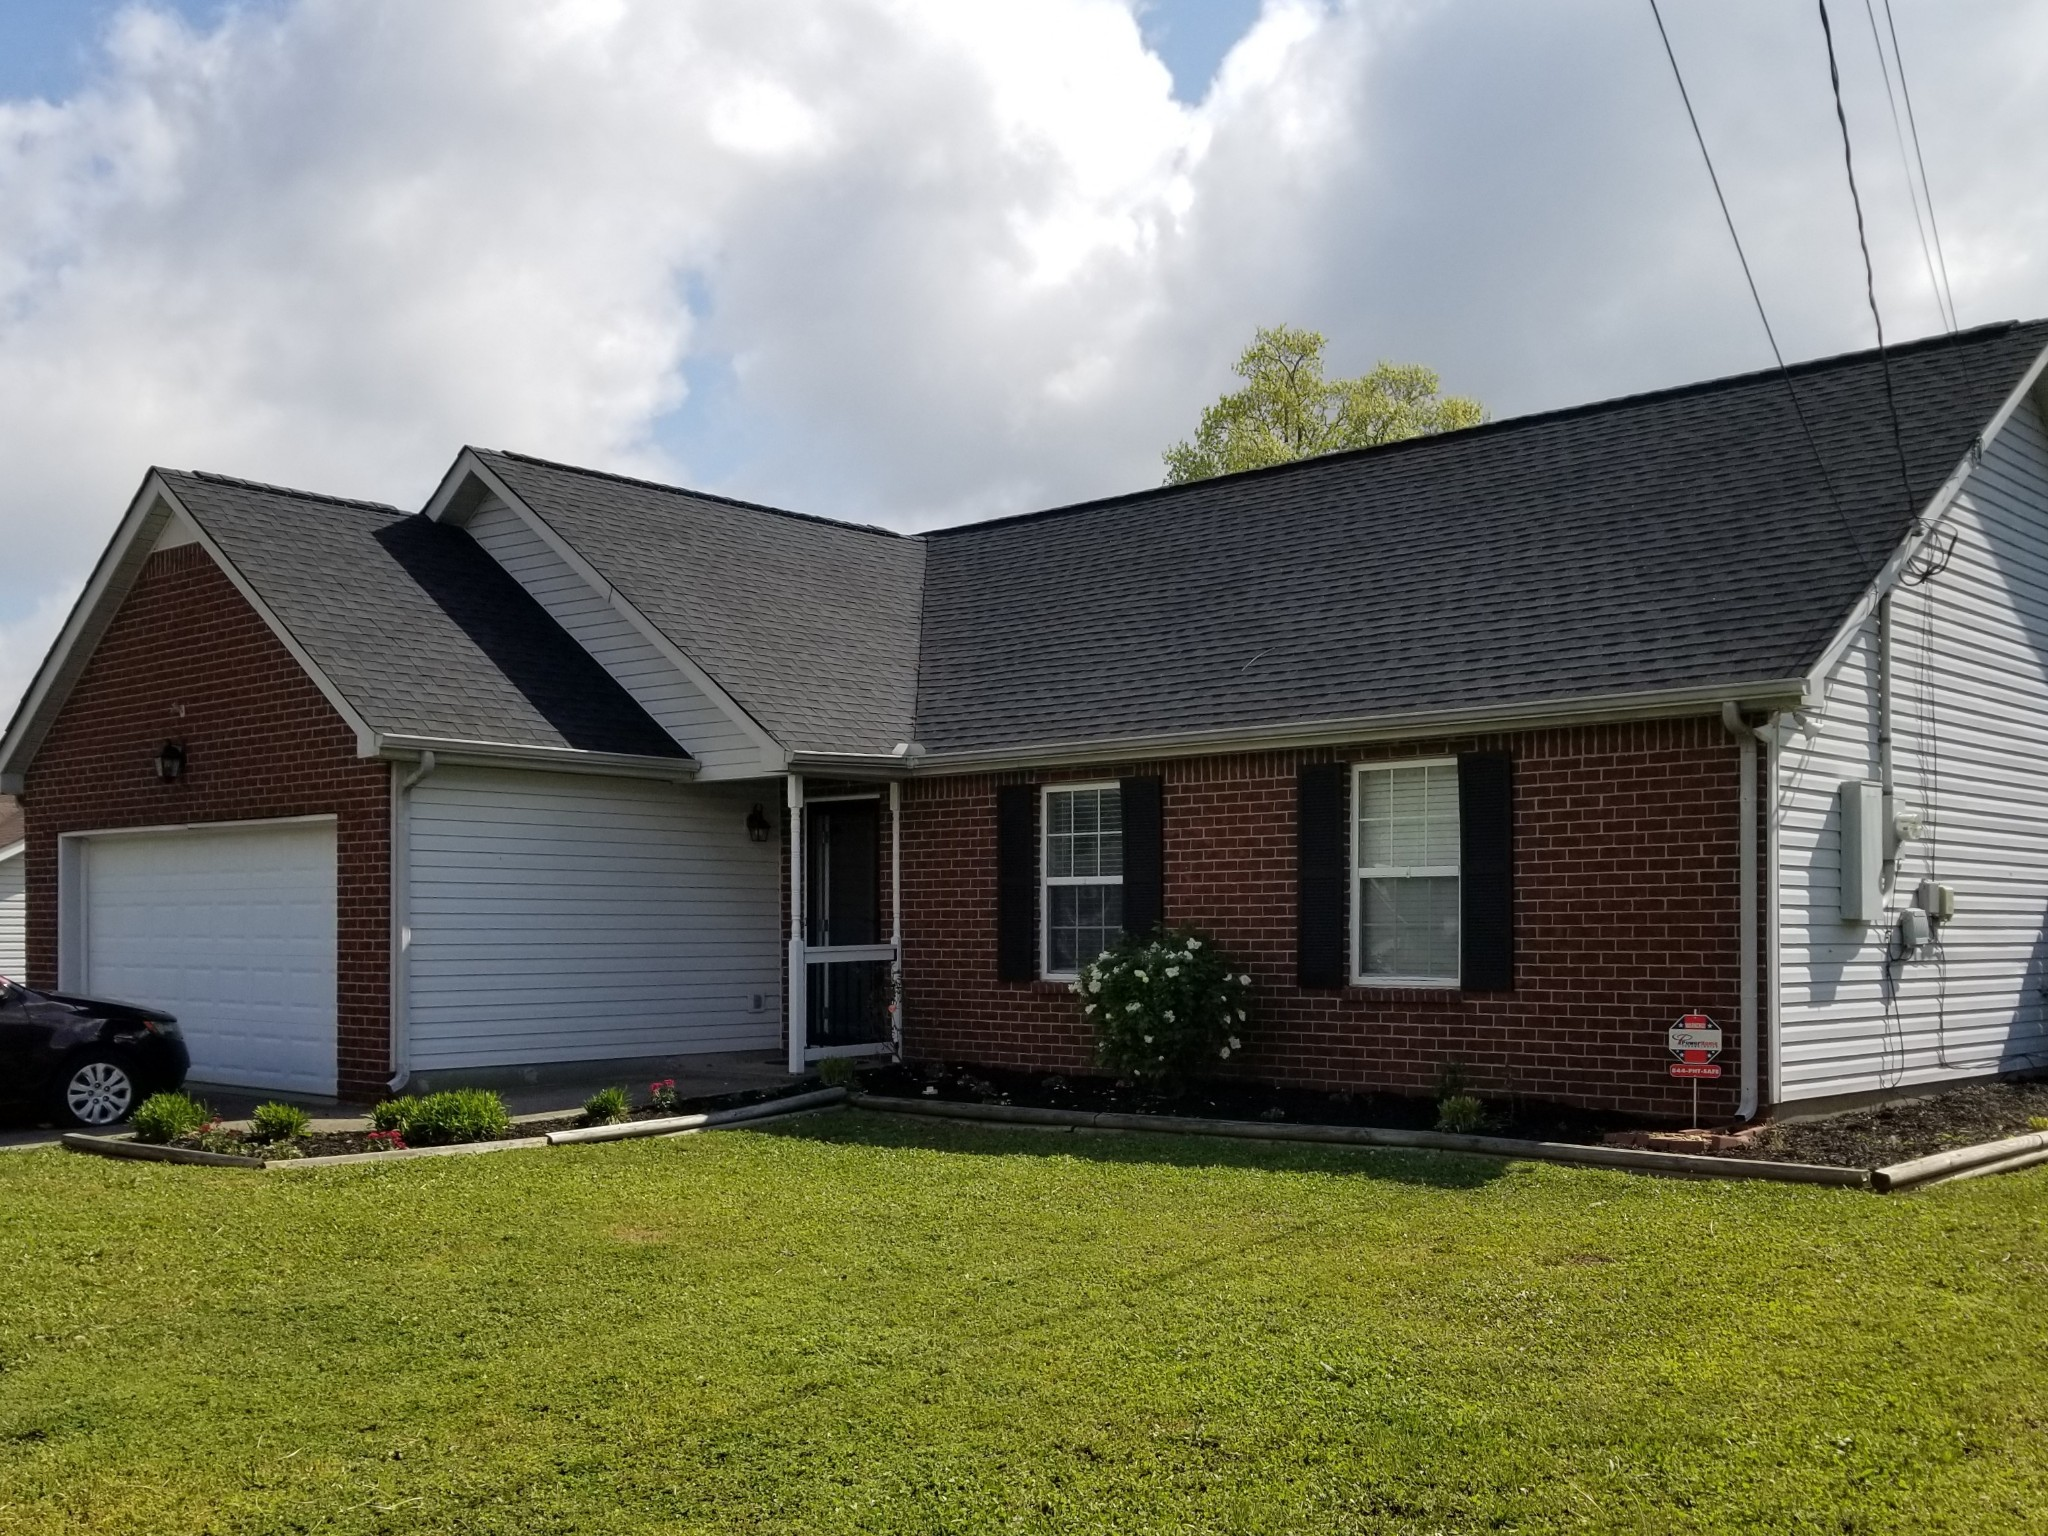 418 Barking Dr Property Photo - Smyrna, TN real estate listing